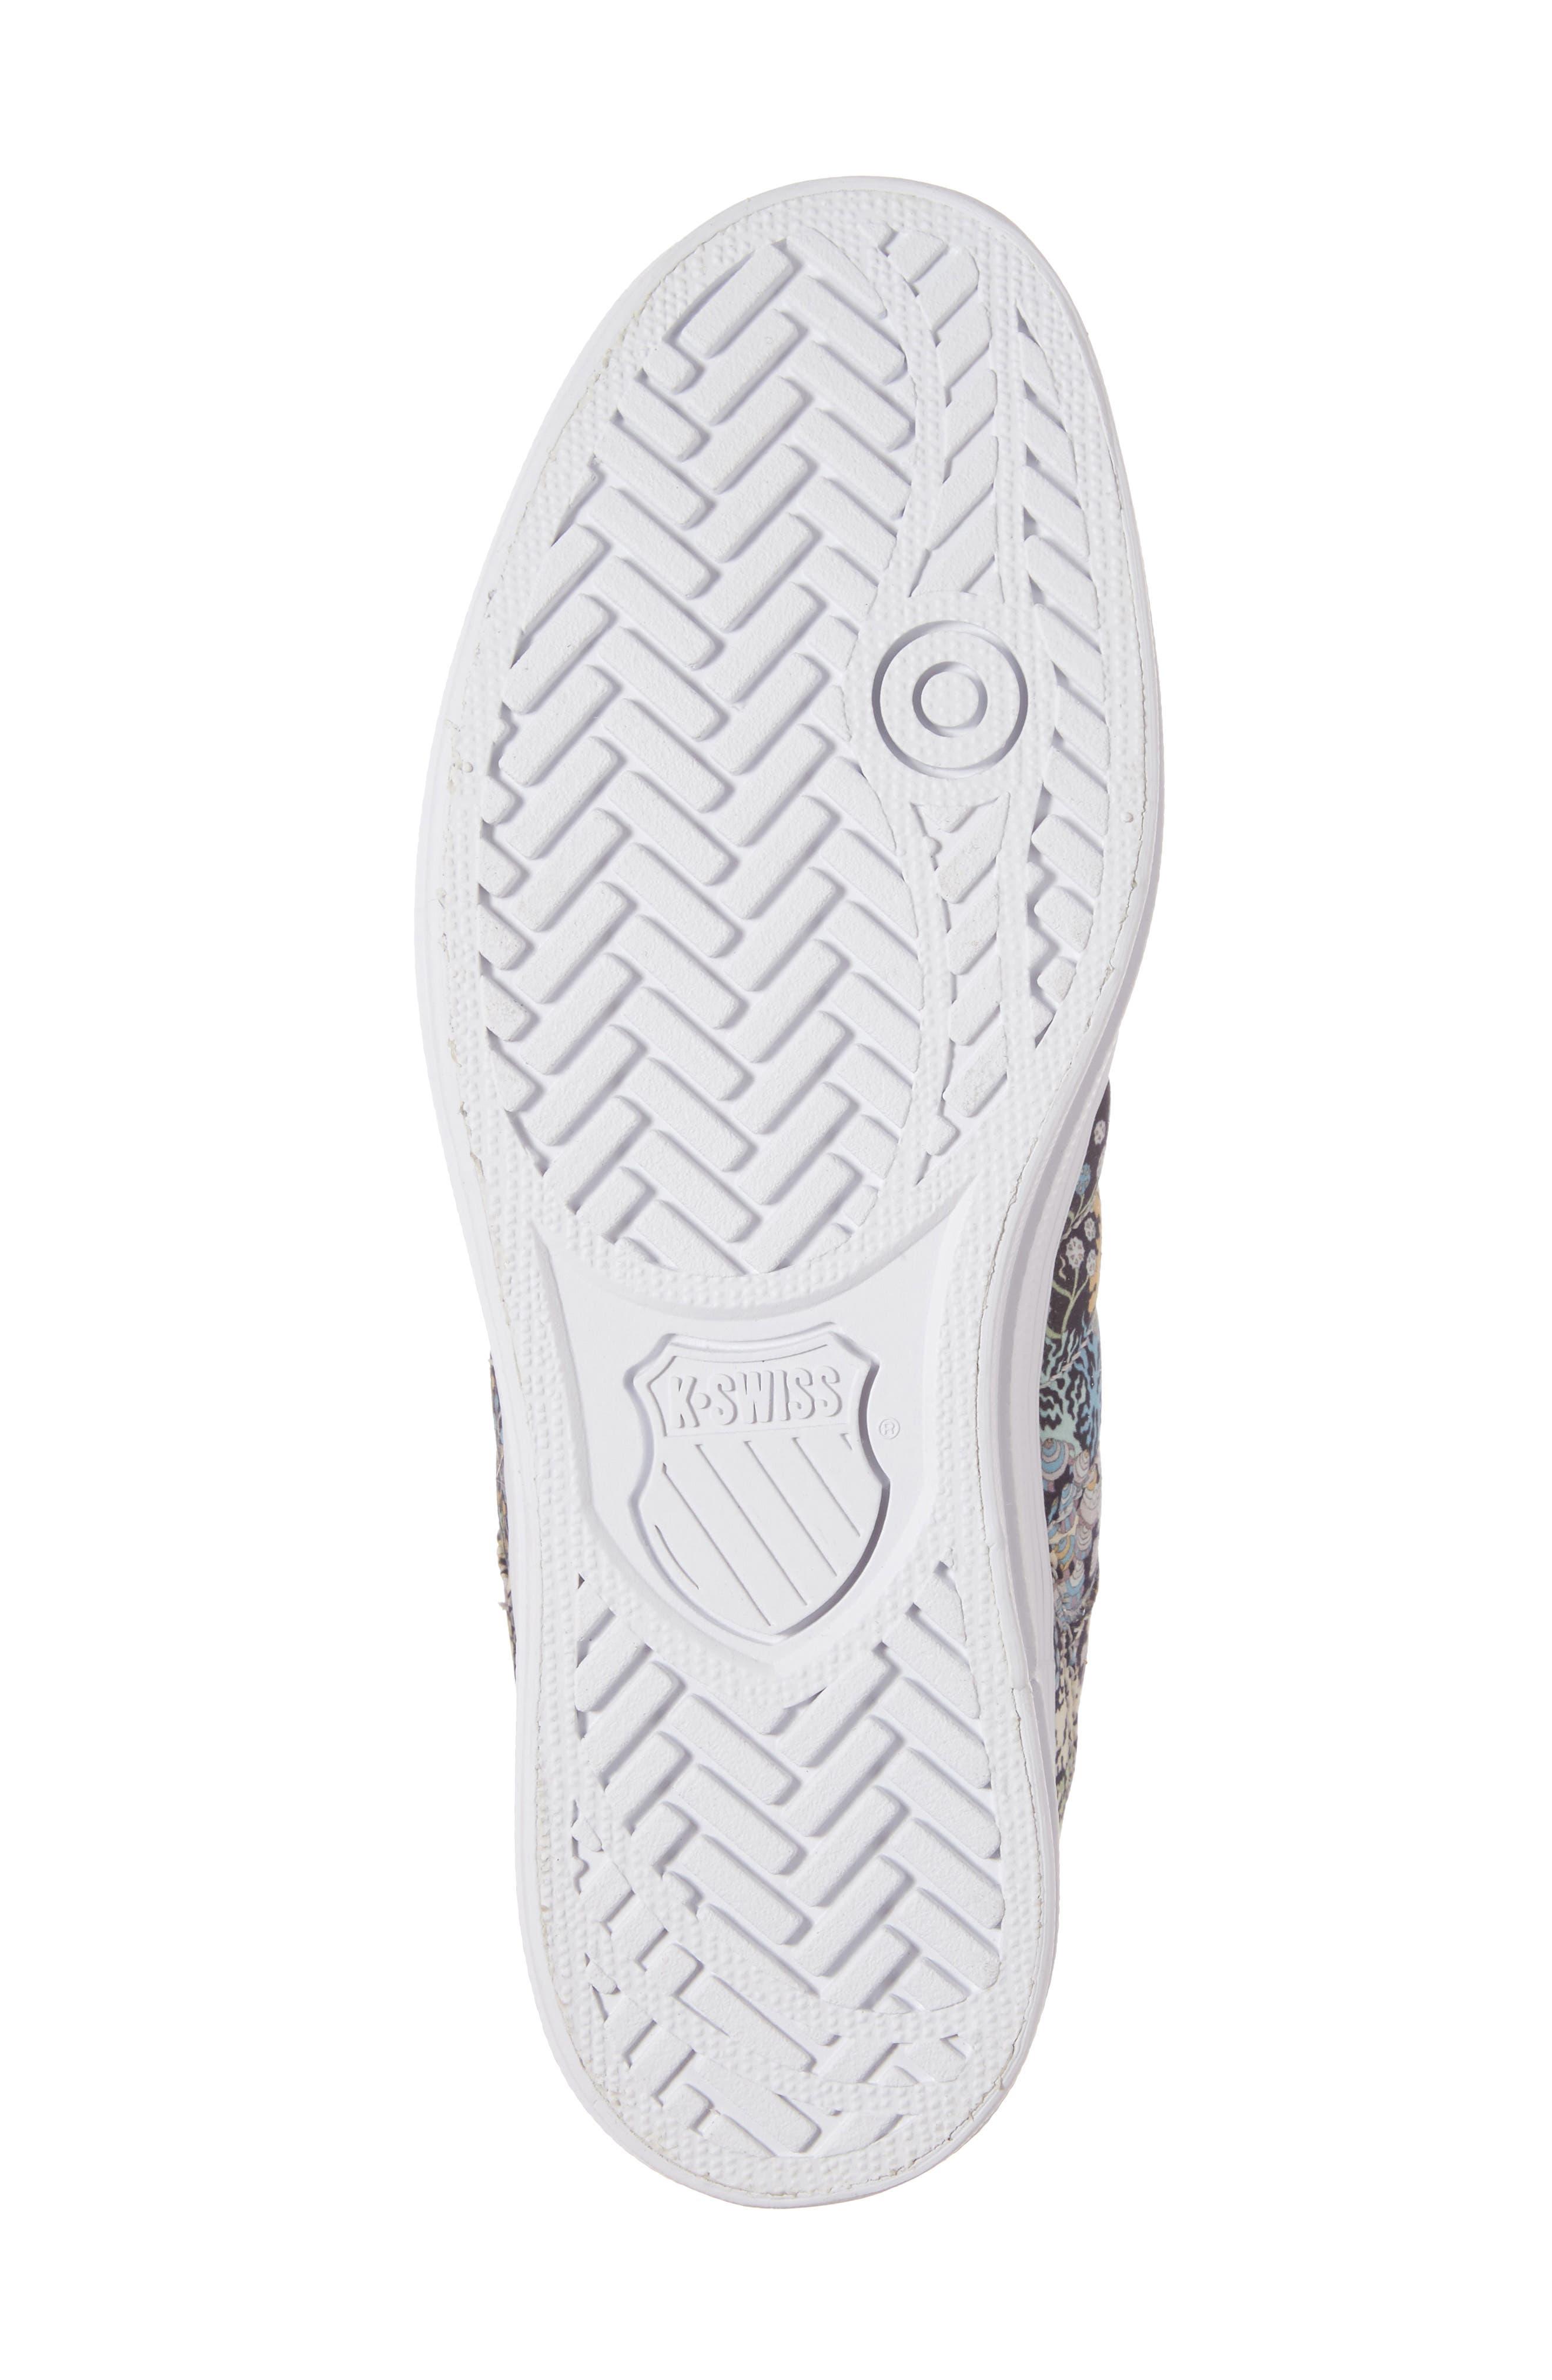 Gstaad Flatform Sneaker,                             Alternate thumbnail 6, color,                             040